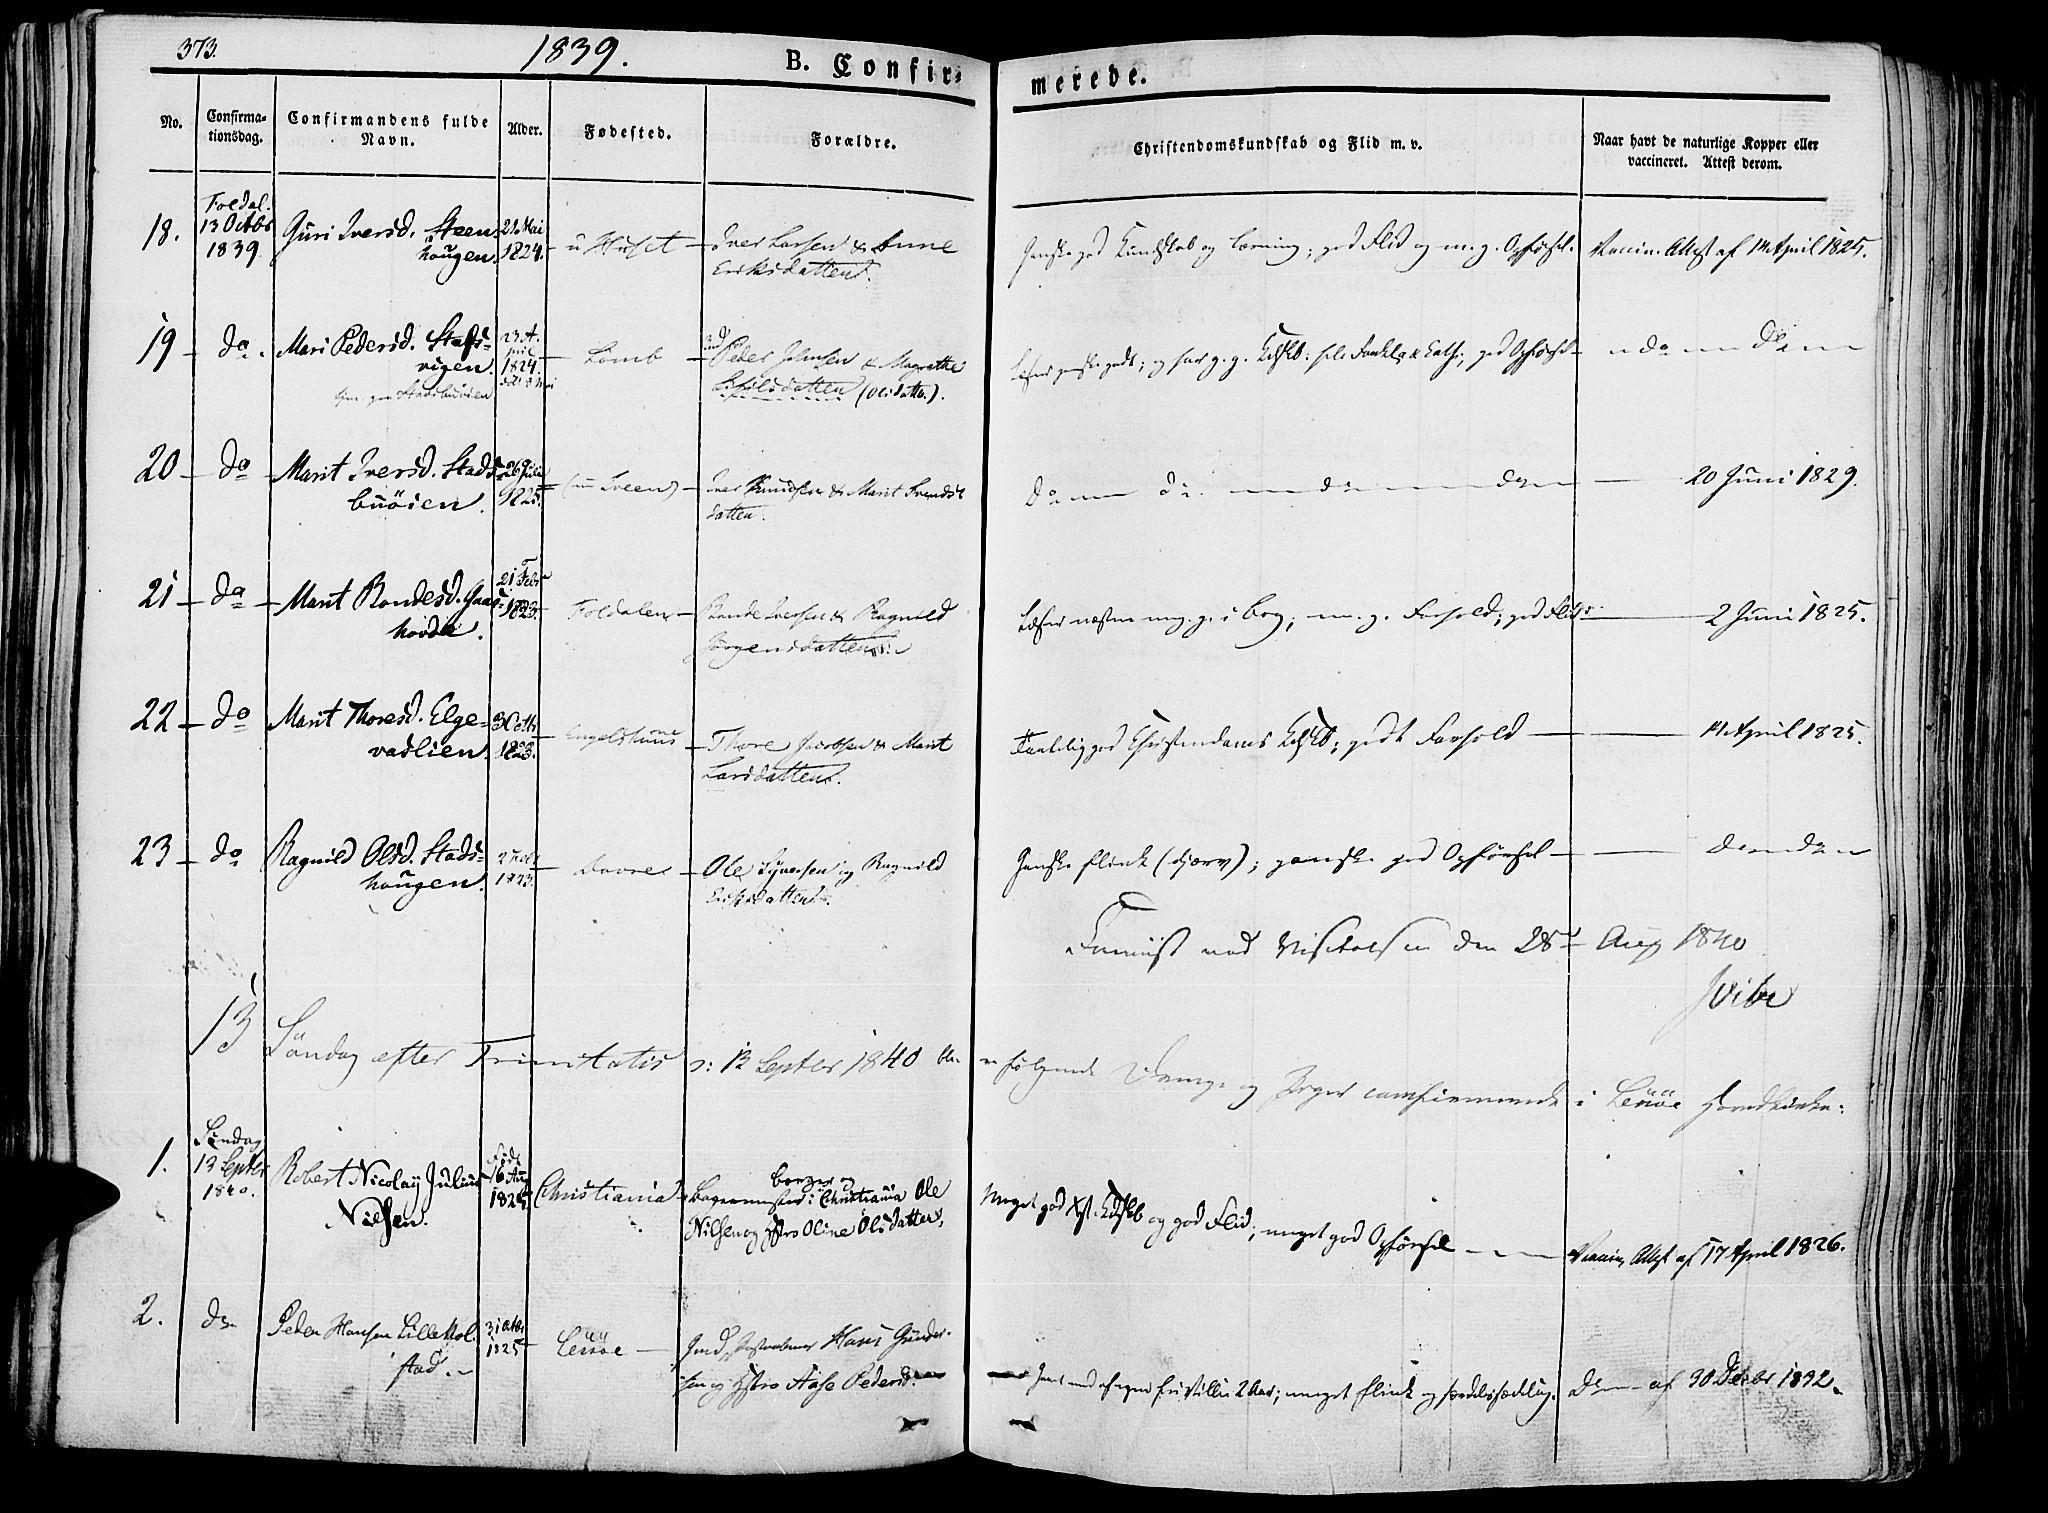 SAH, Lesja prestekontor, Ministerialbok nr. 5, 1830-1842, s. 373